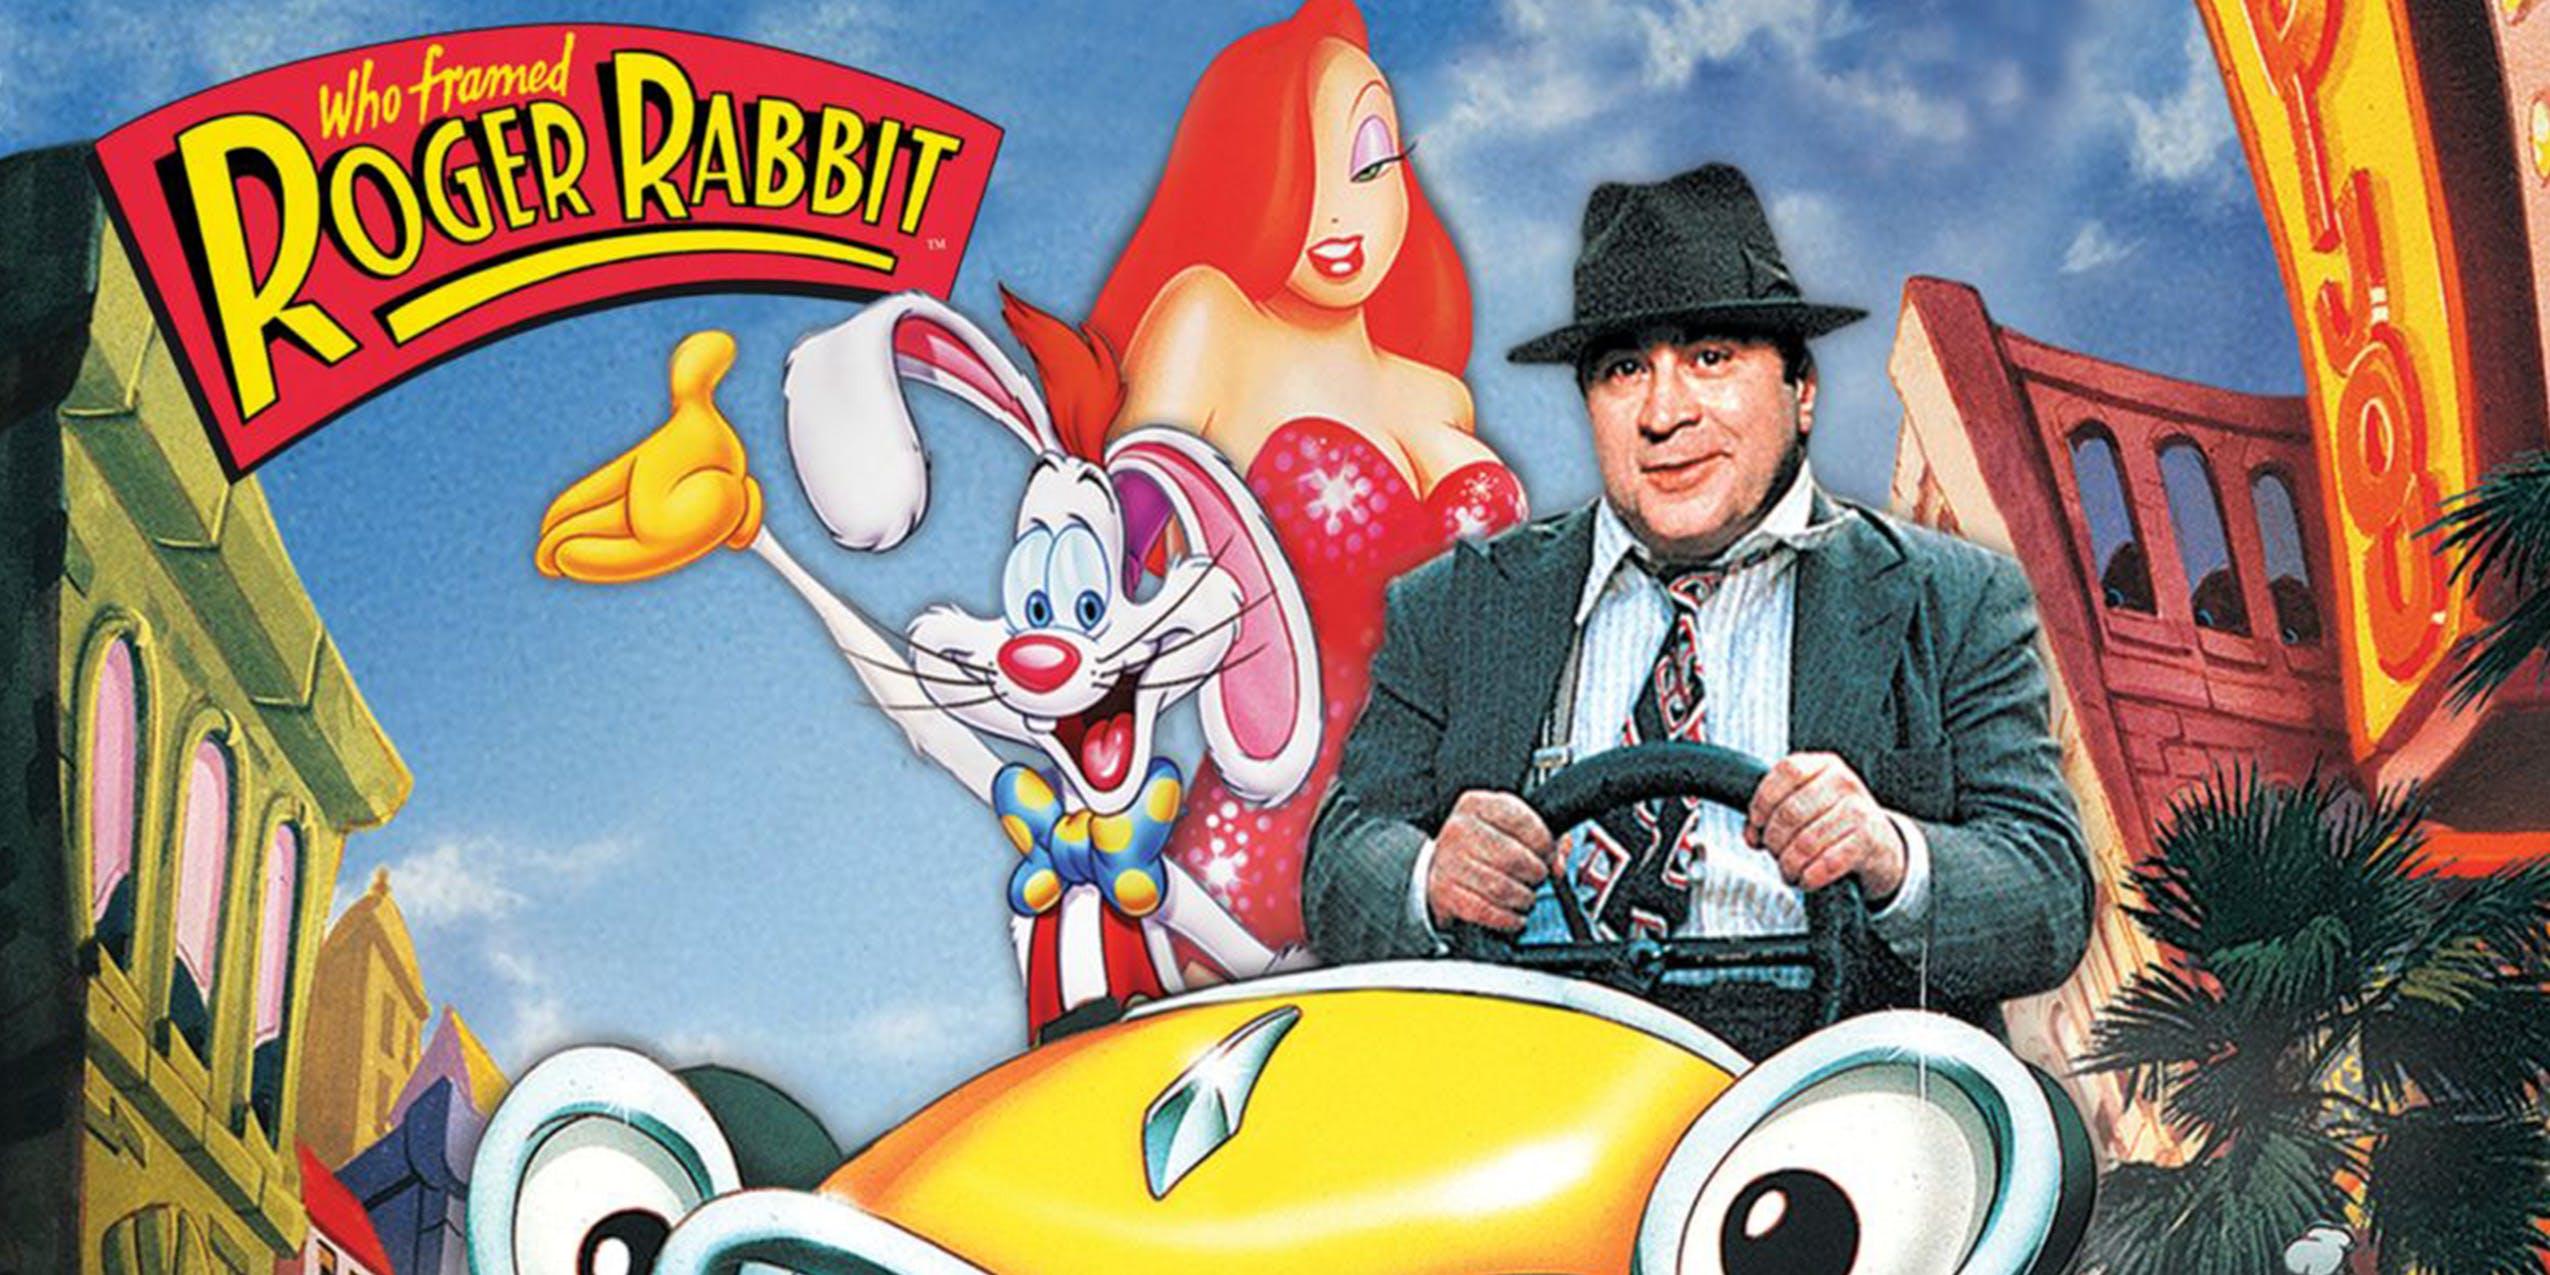 disney plys best movies Roger rabbit